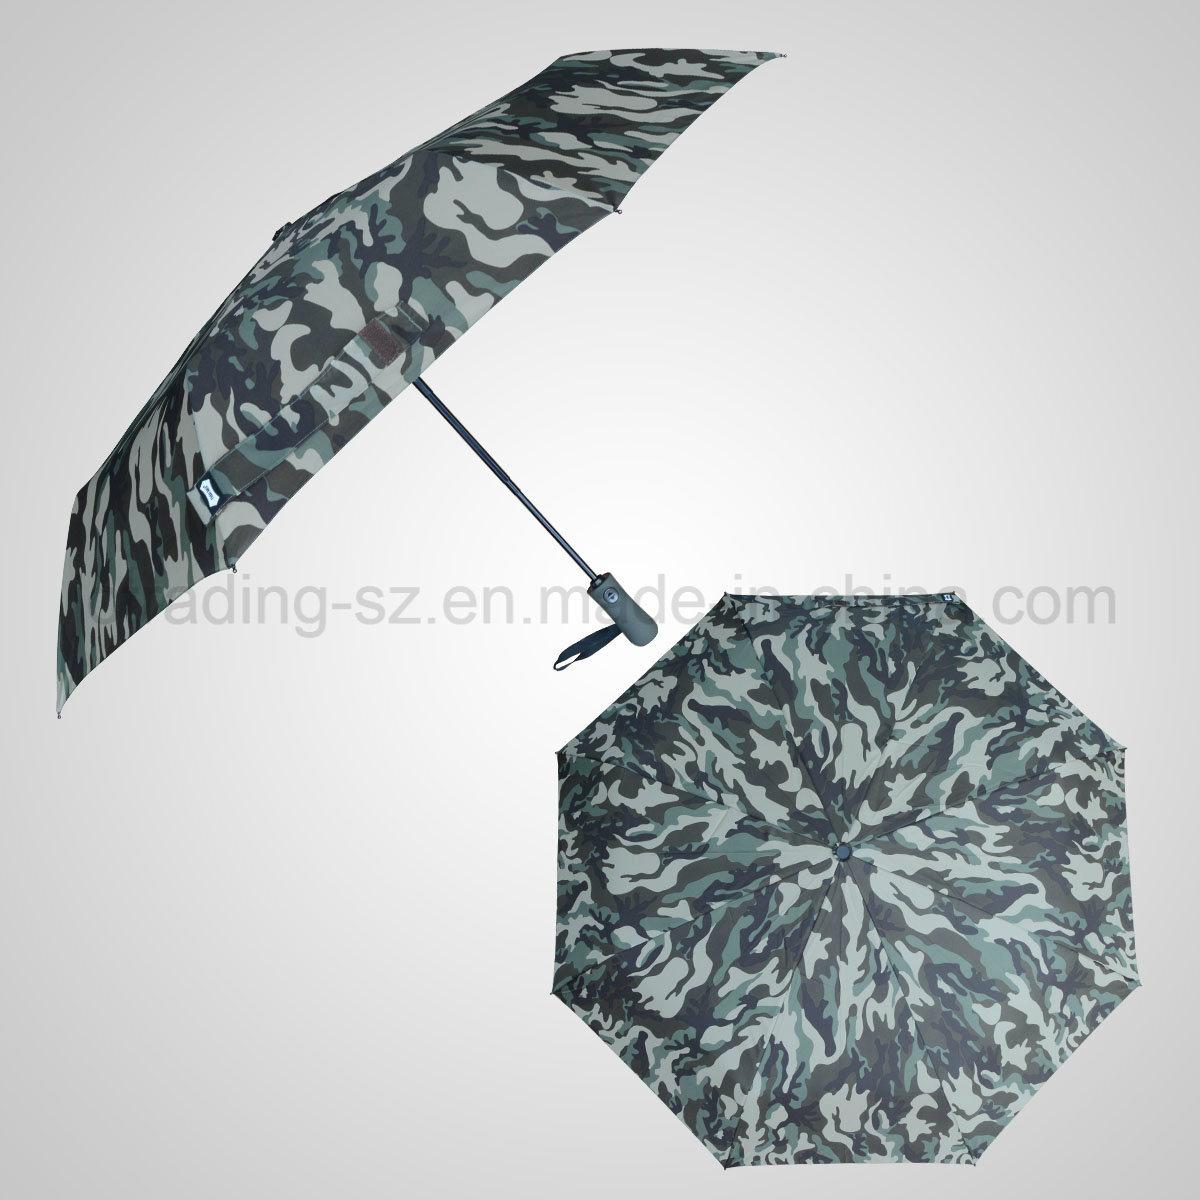 3 Folding Automatic Open&Close Storm Golf Umbrella Rain/Sun Umbrella (JF-AGF309)